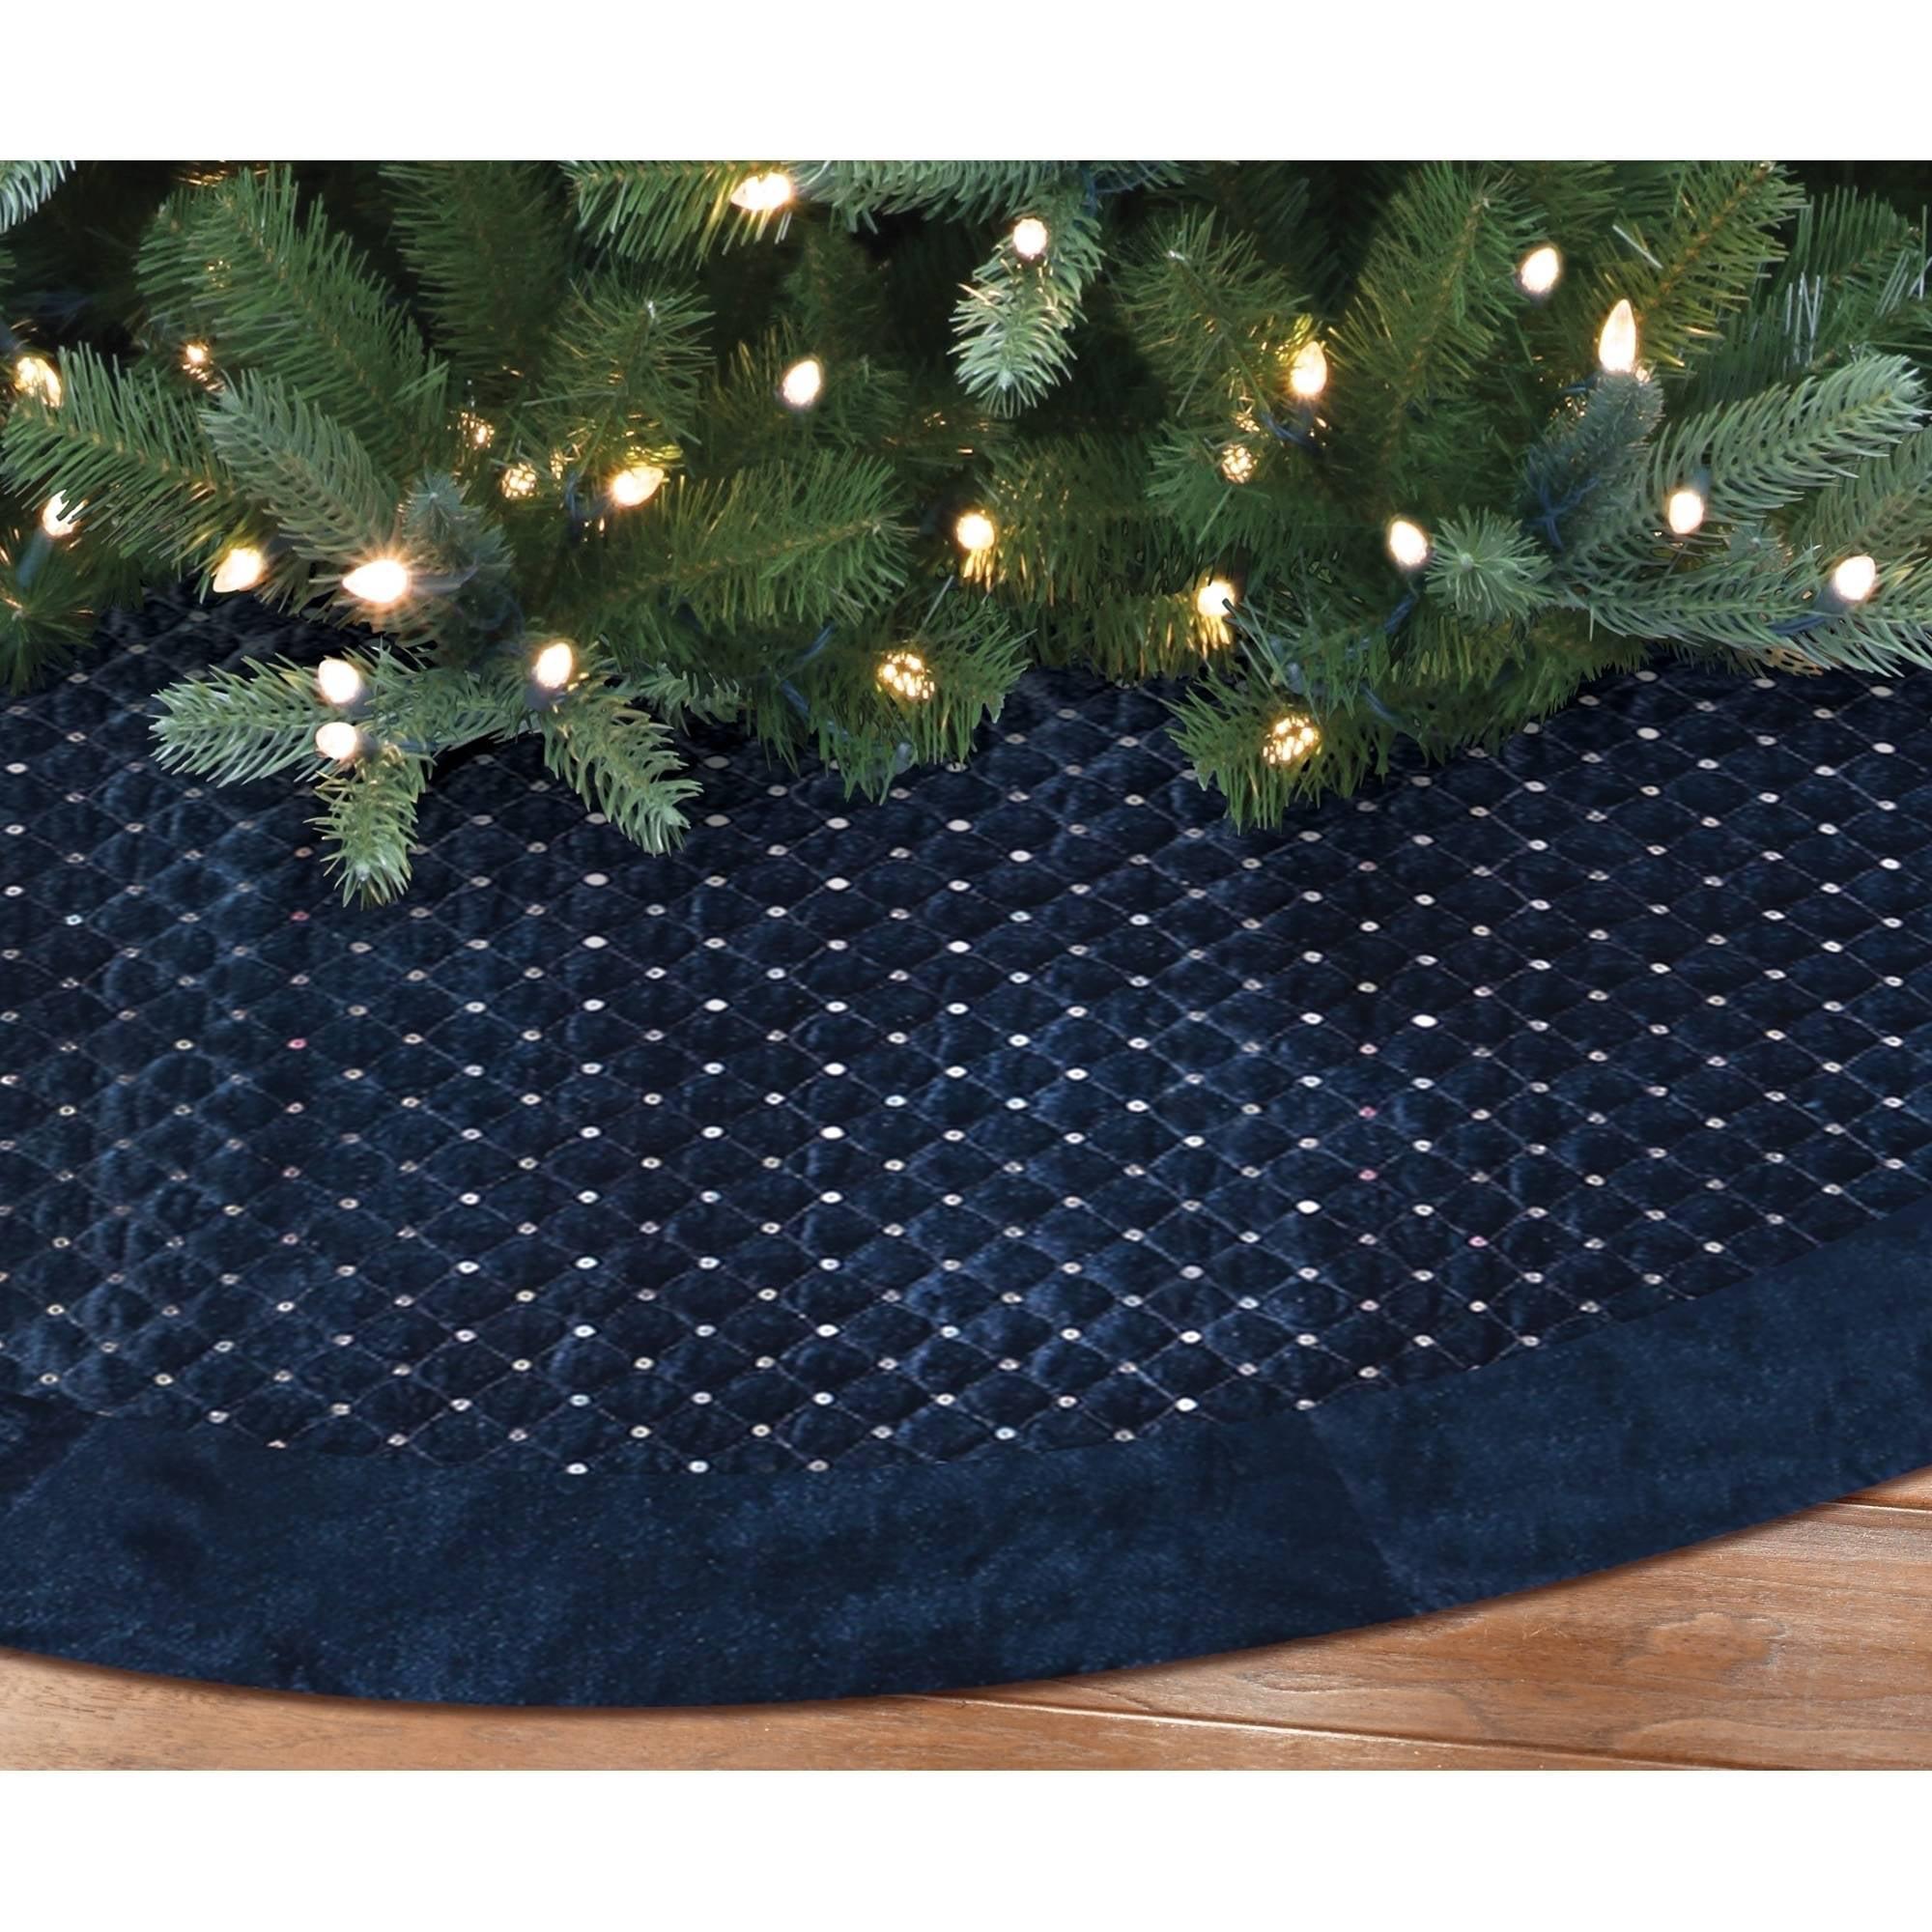 Holiday Time Christmas Decor 48 Quilted Velvet Tree Skirt With Silver Sequins And Velvet Border Blue Walmart Com Walmart Com